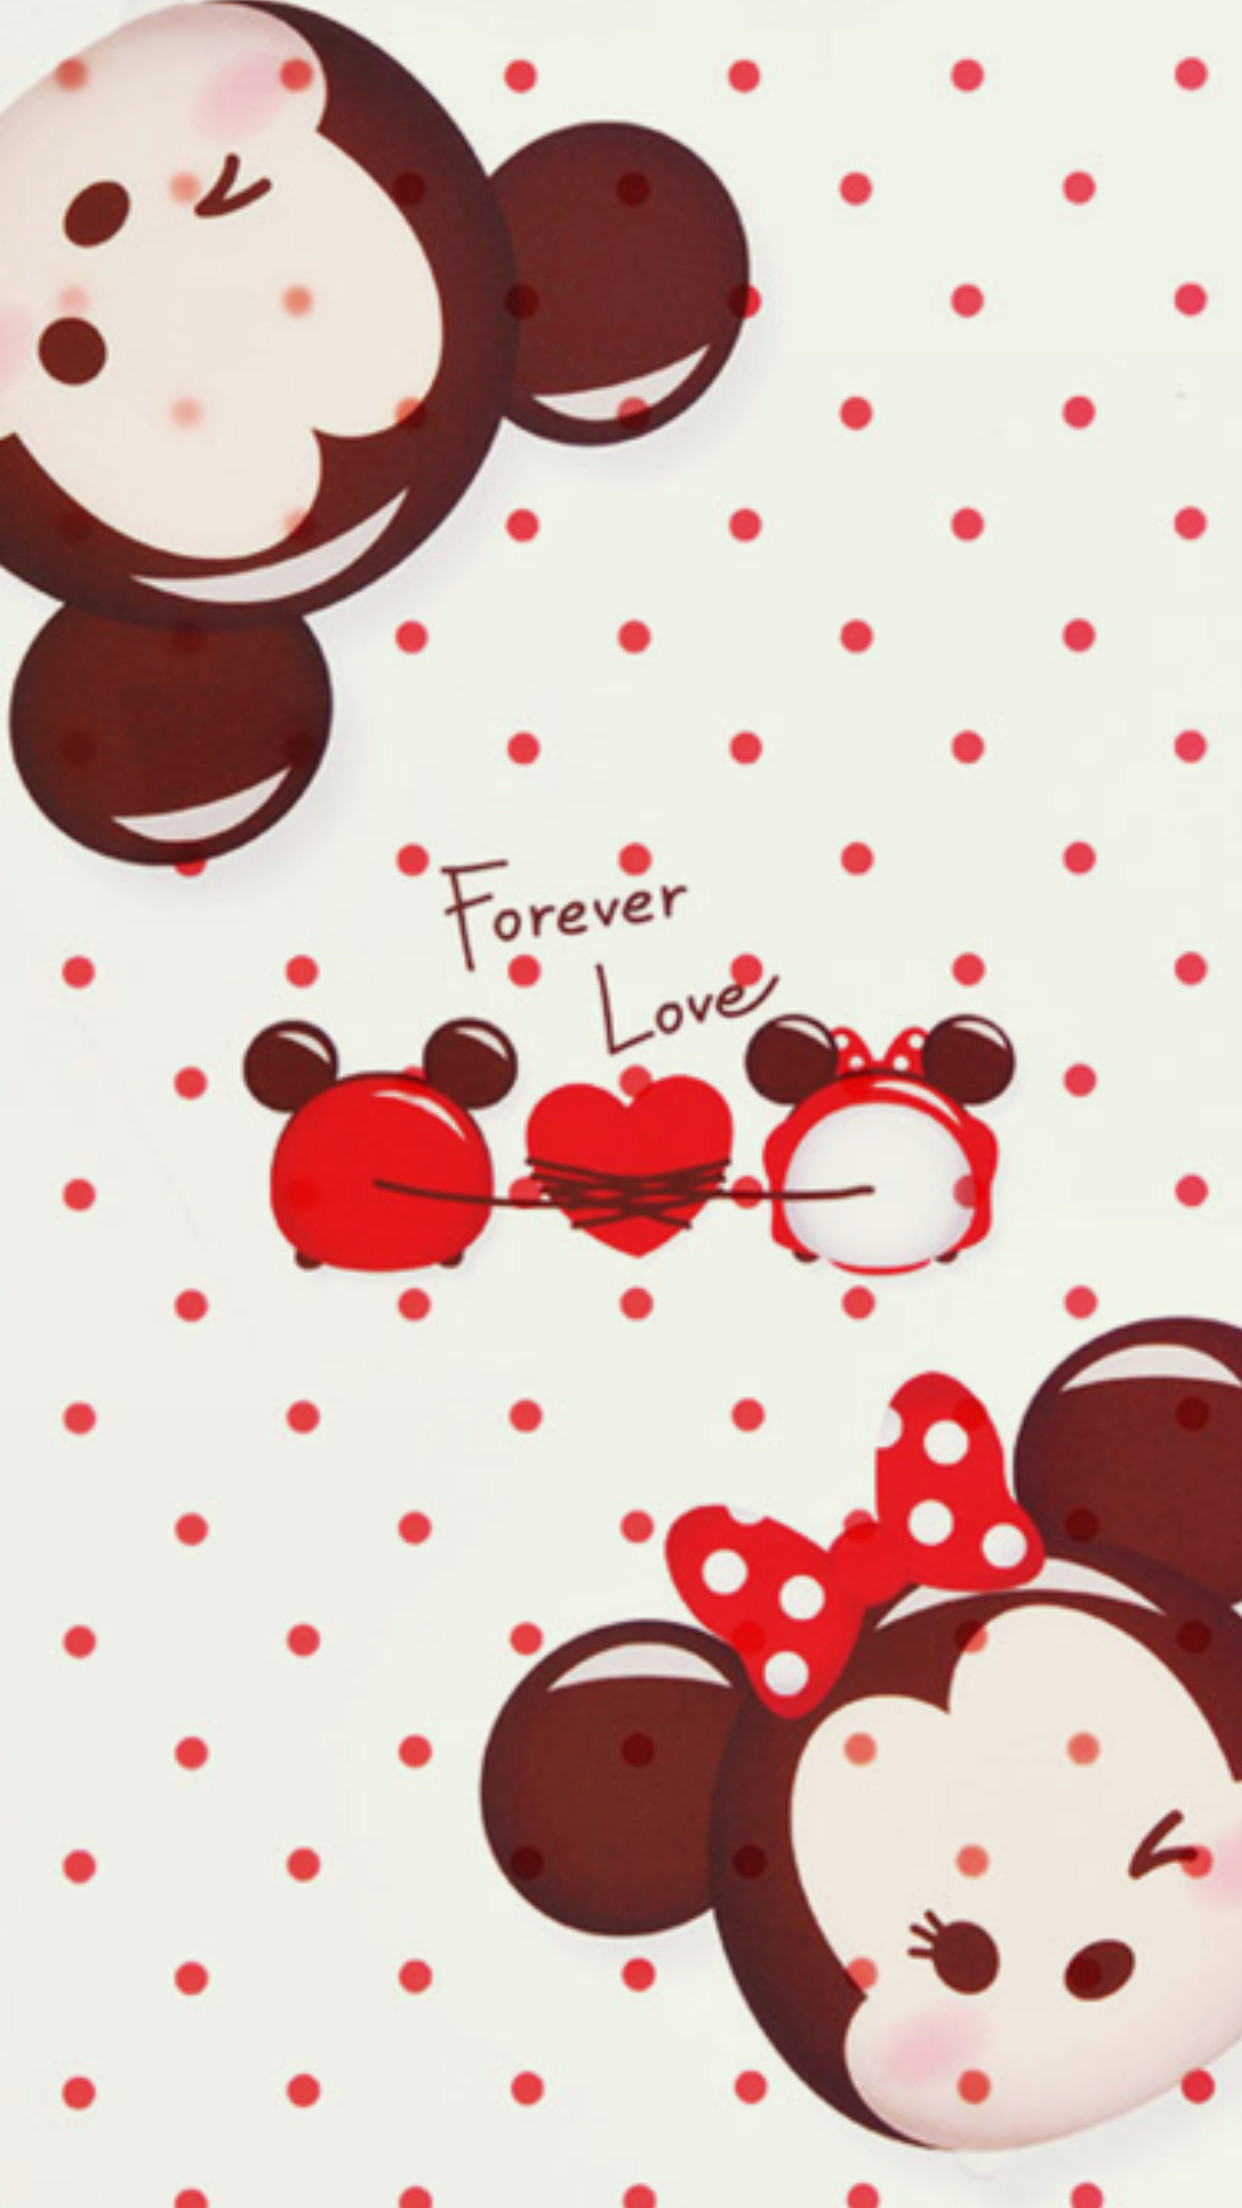 Falling Hearts Wallpaper Wallpaper Elmo Tumblr 45 Images